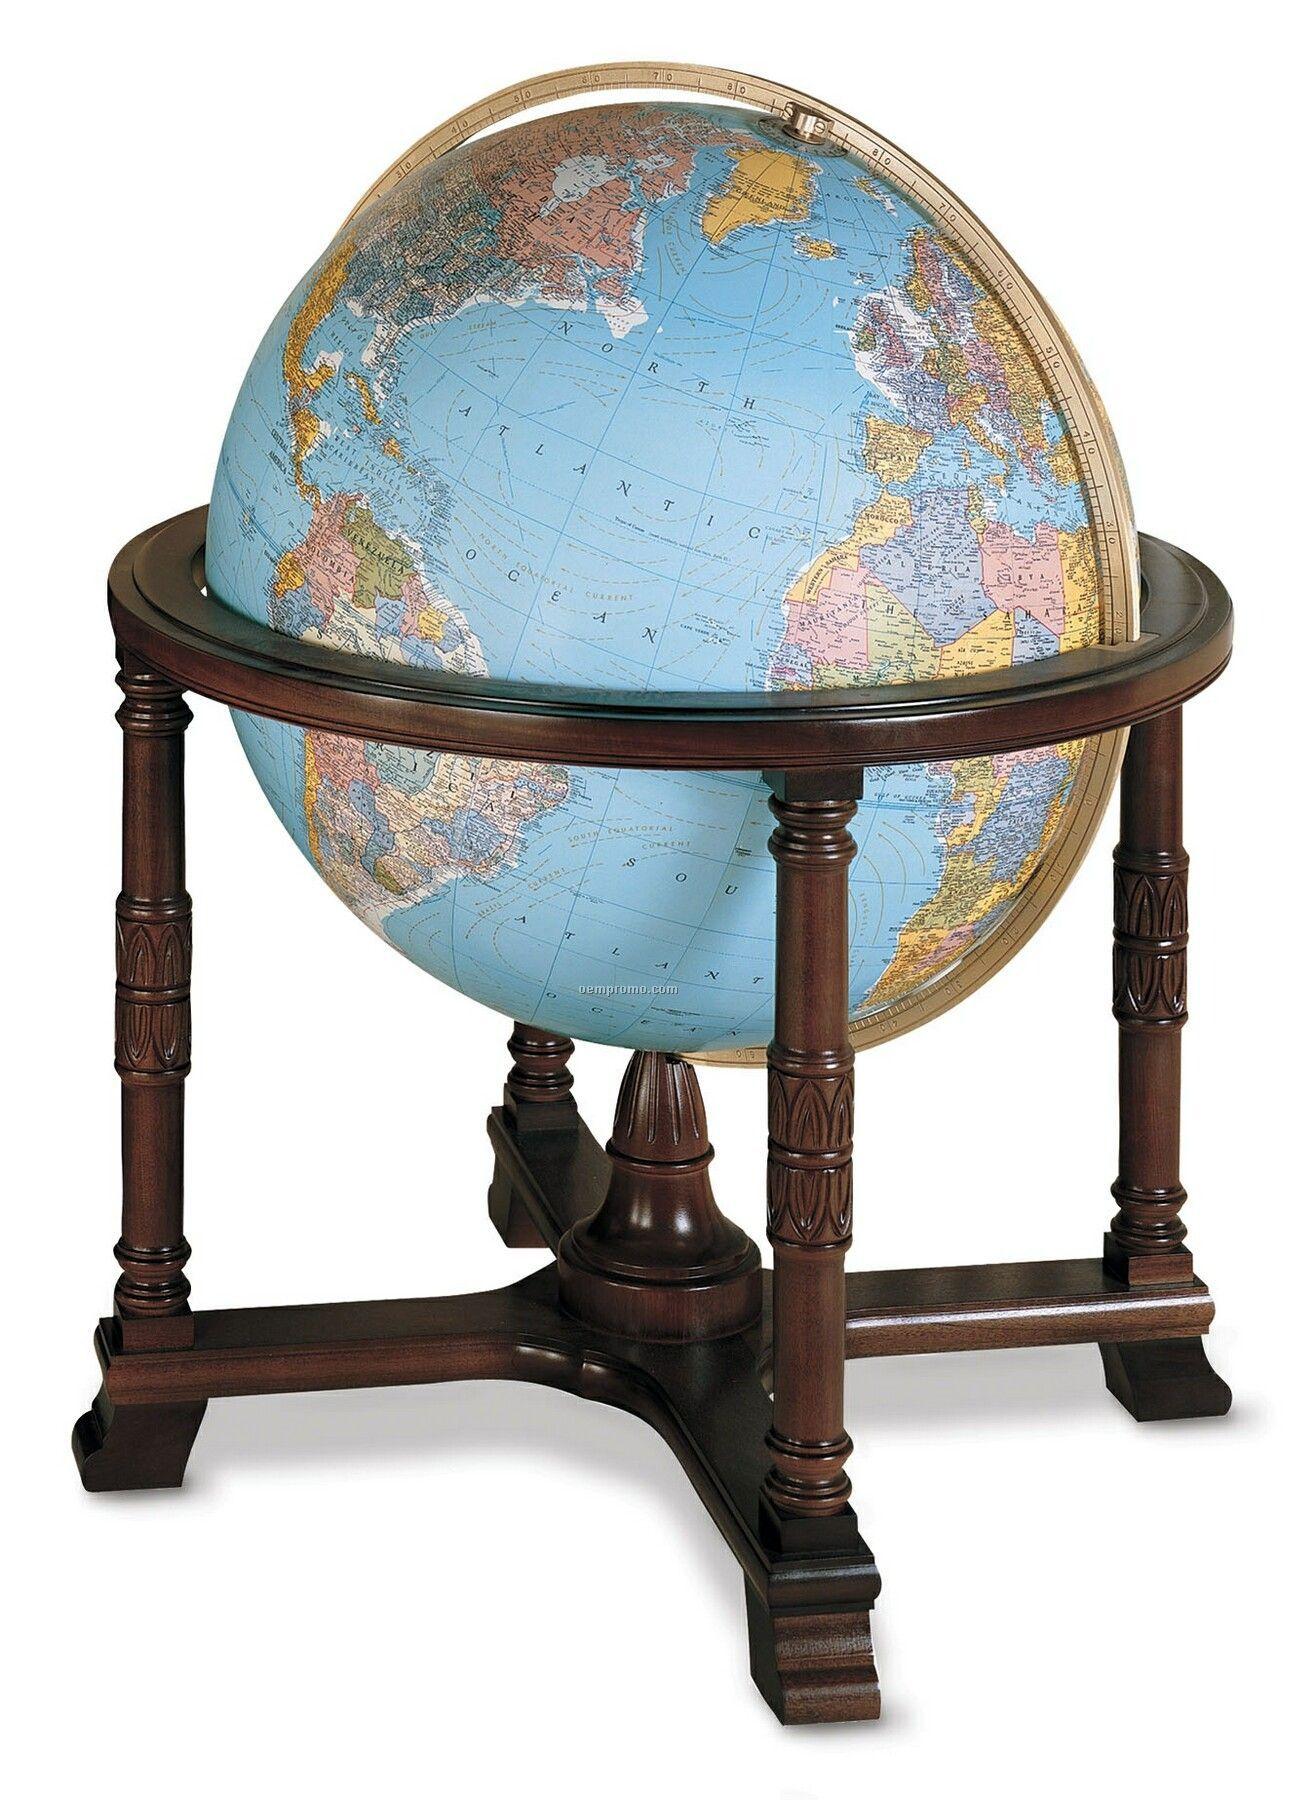 Illuminated Diplomat Blue Ocean Globe